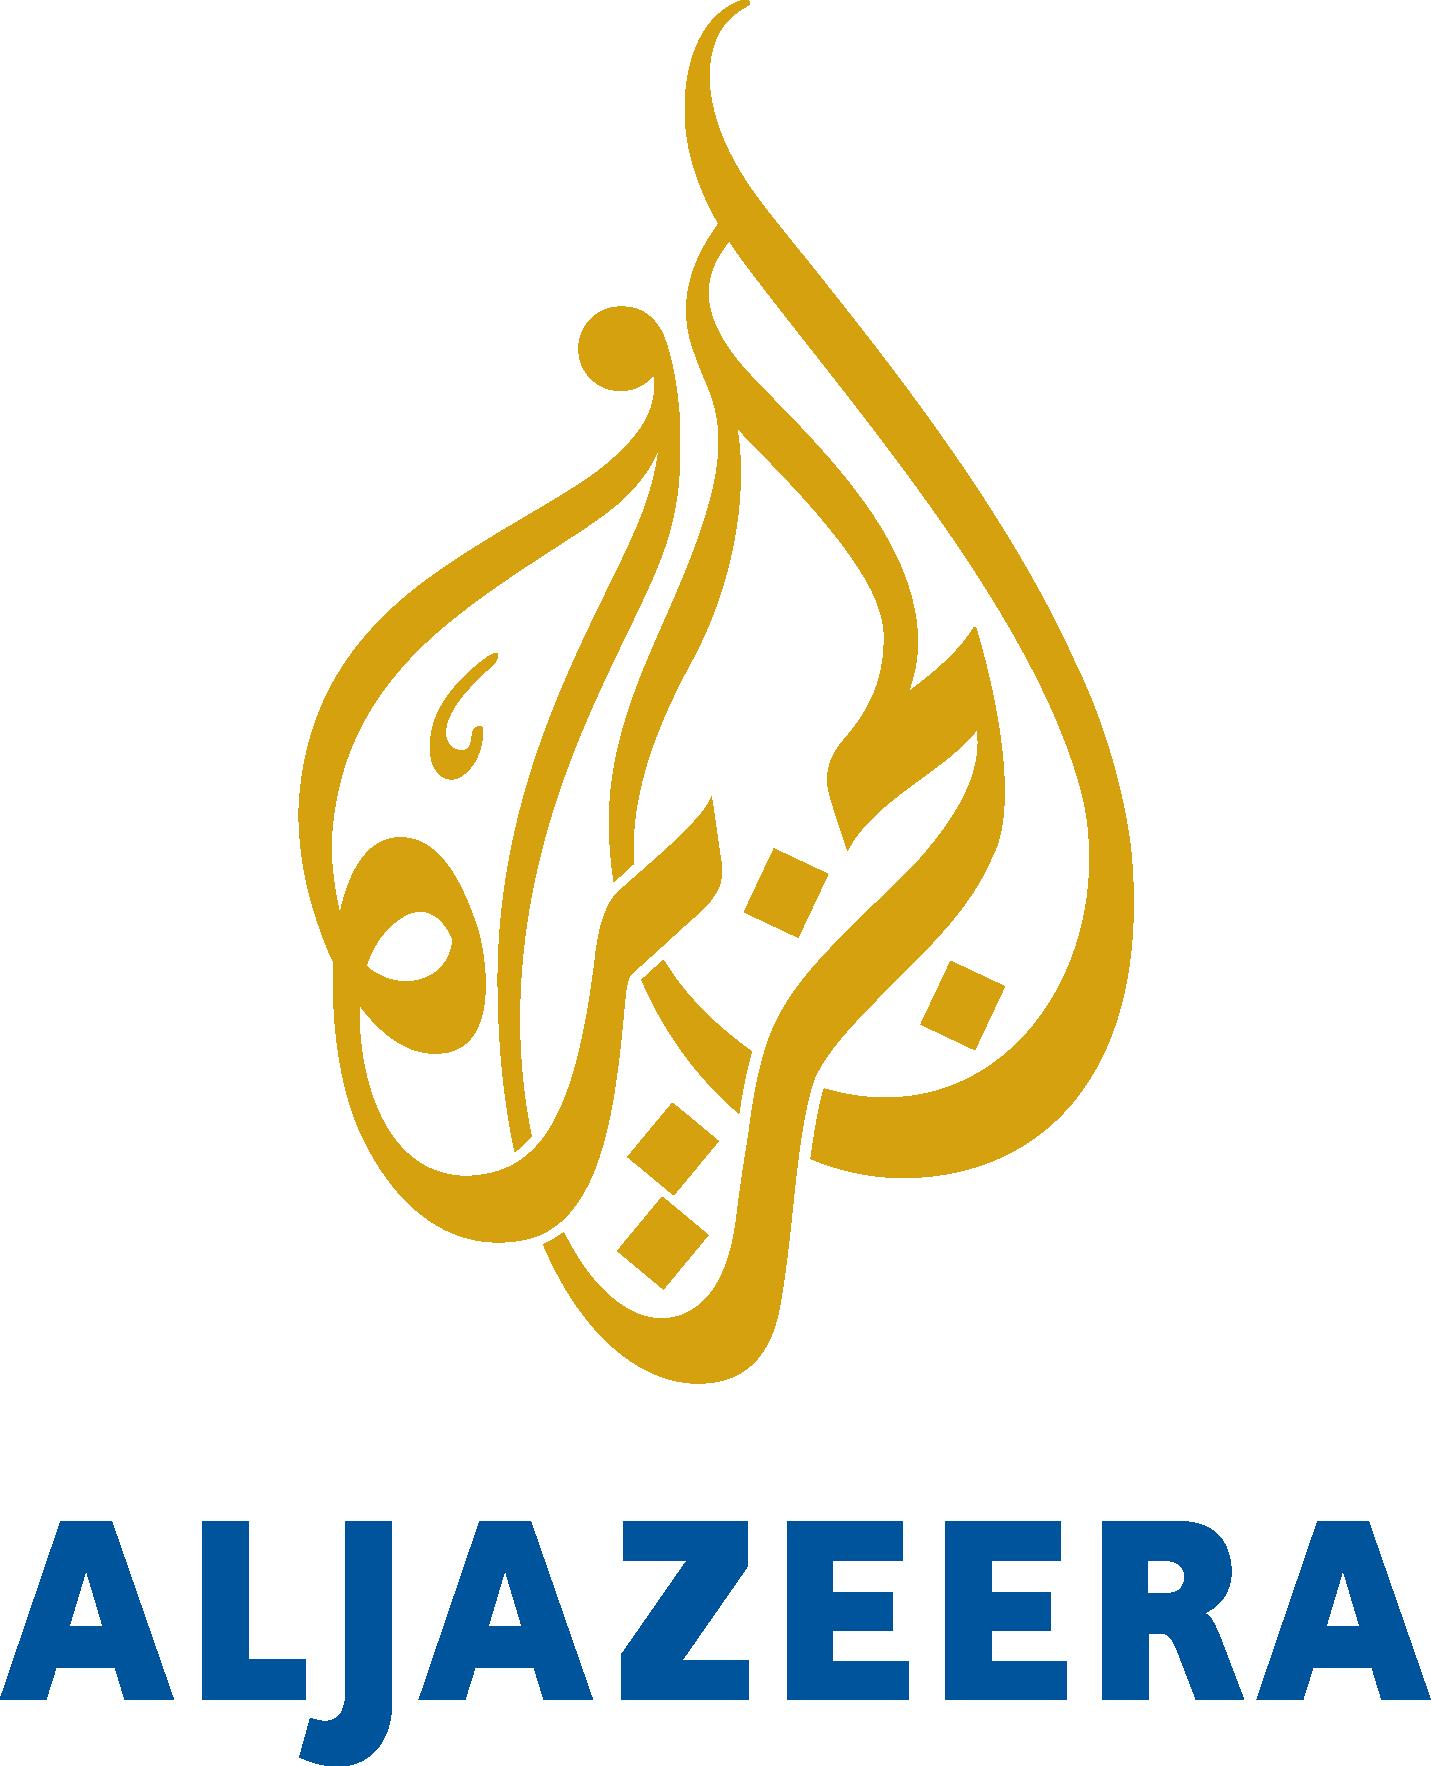 al-jazeera-logo - Al Jazeera Television Logo PNG